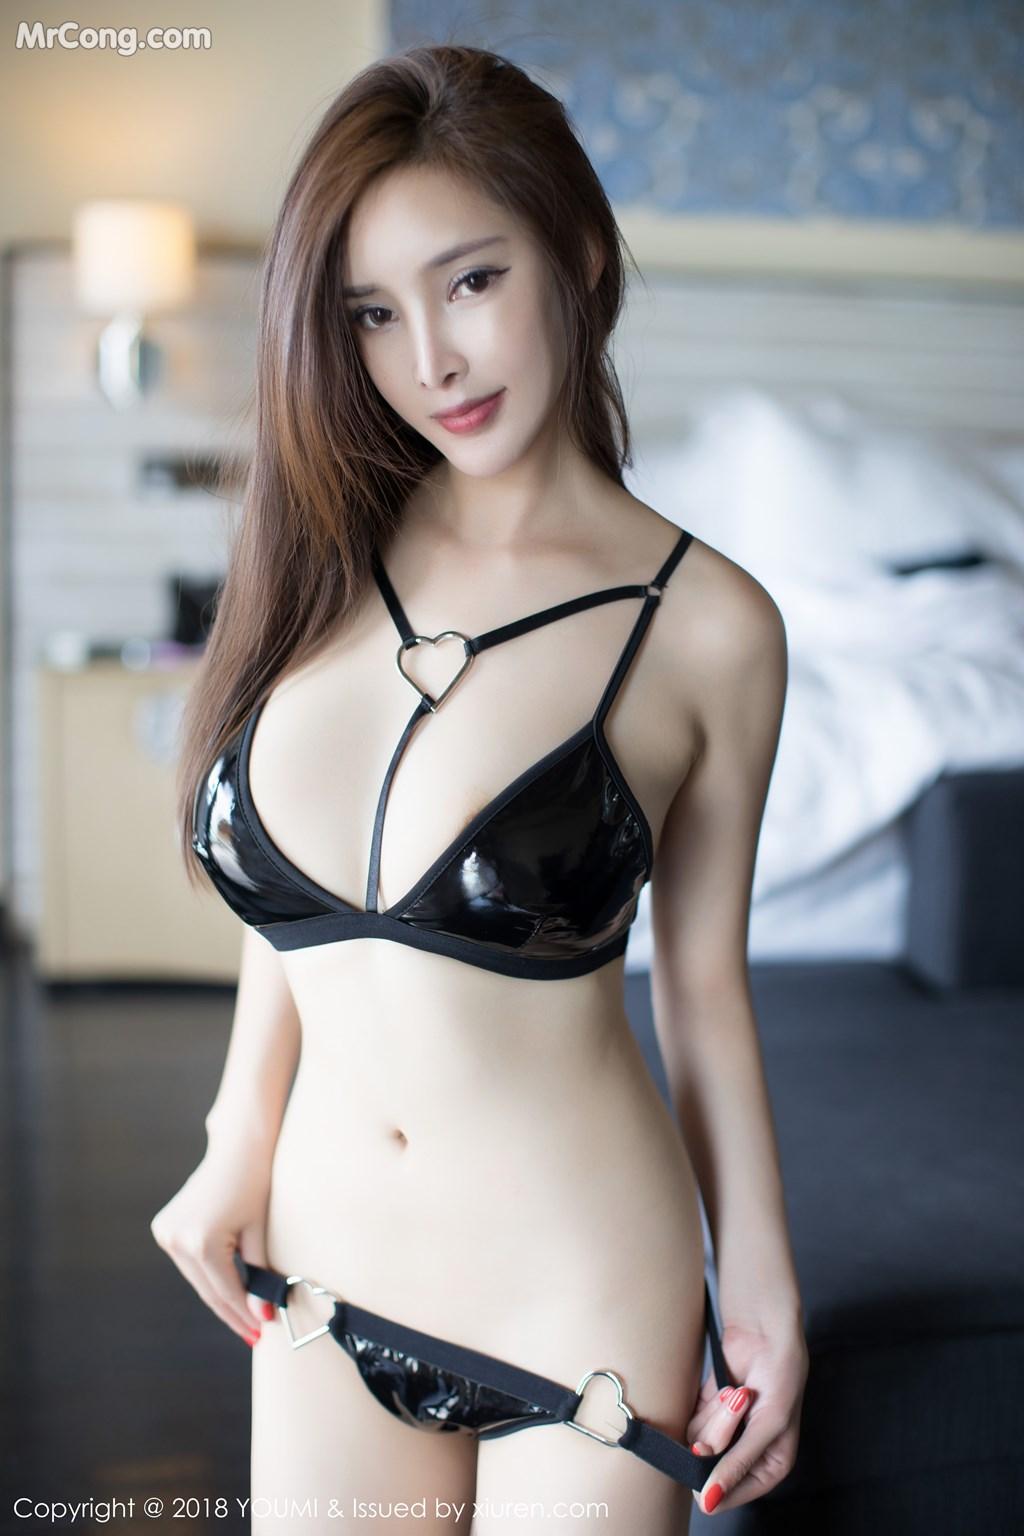 Image YouMi-Vol.237-Tu-Fei-Yuan-Ai-Cuo-Qiong-MrCong.com-002 in post YouMi Vol.237: Người mẫu 奶瓶土肥圆 (46 ảnh)